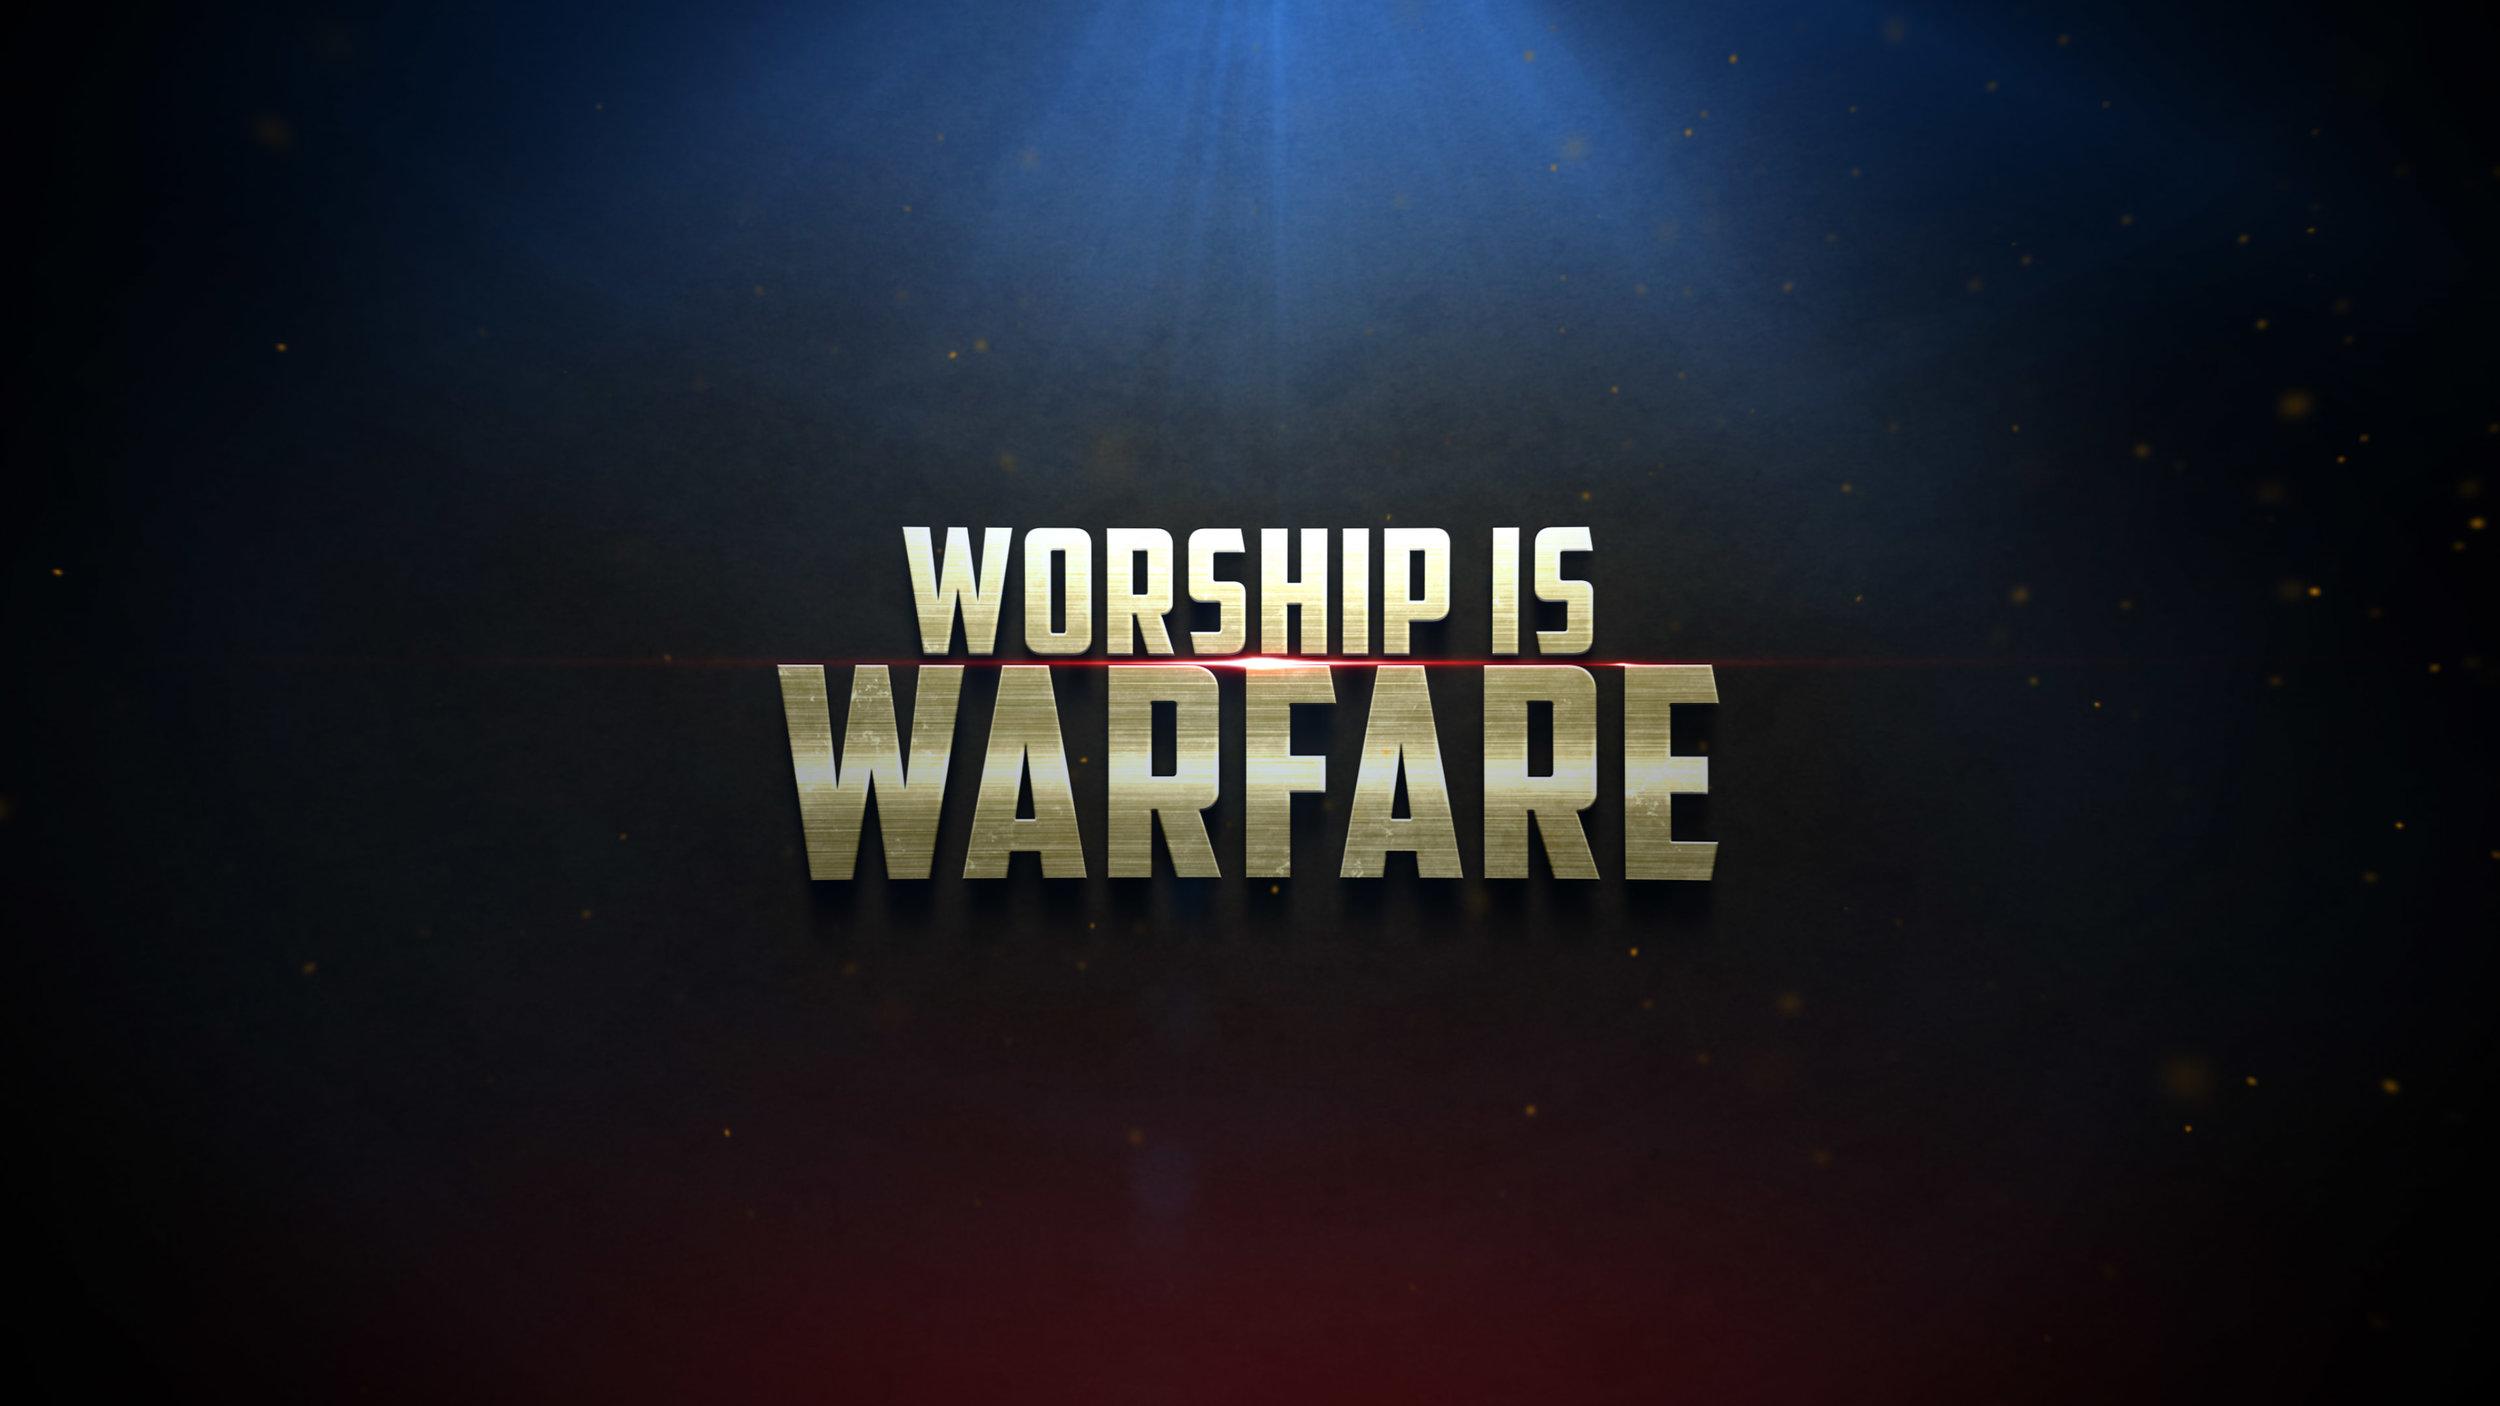 Worship is Warfare screen.jpg